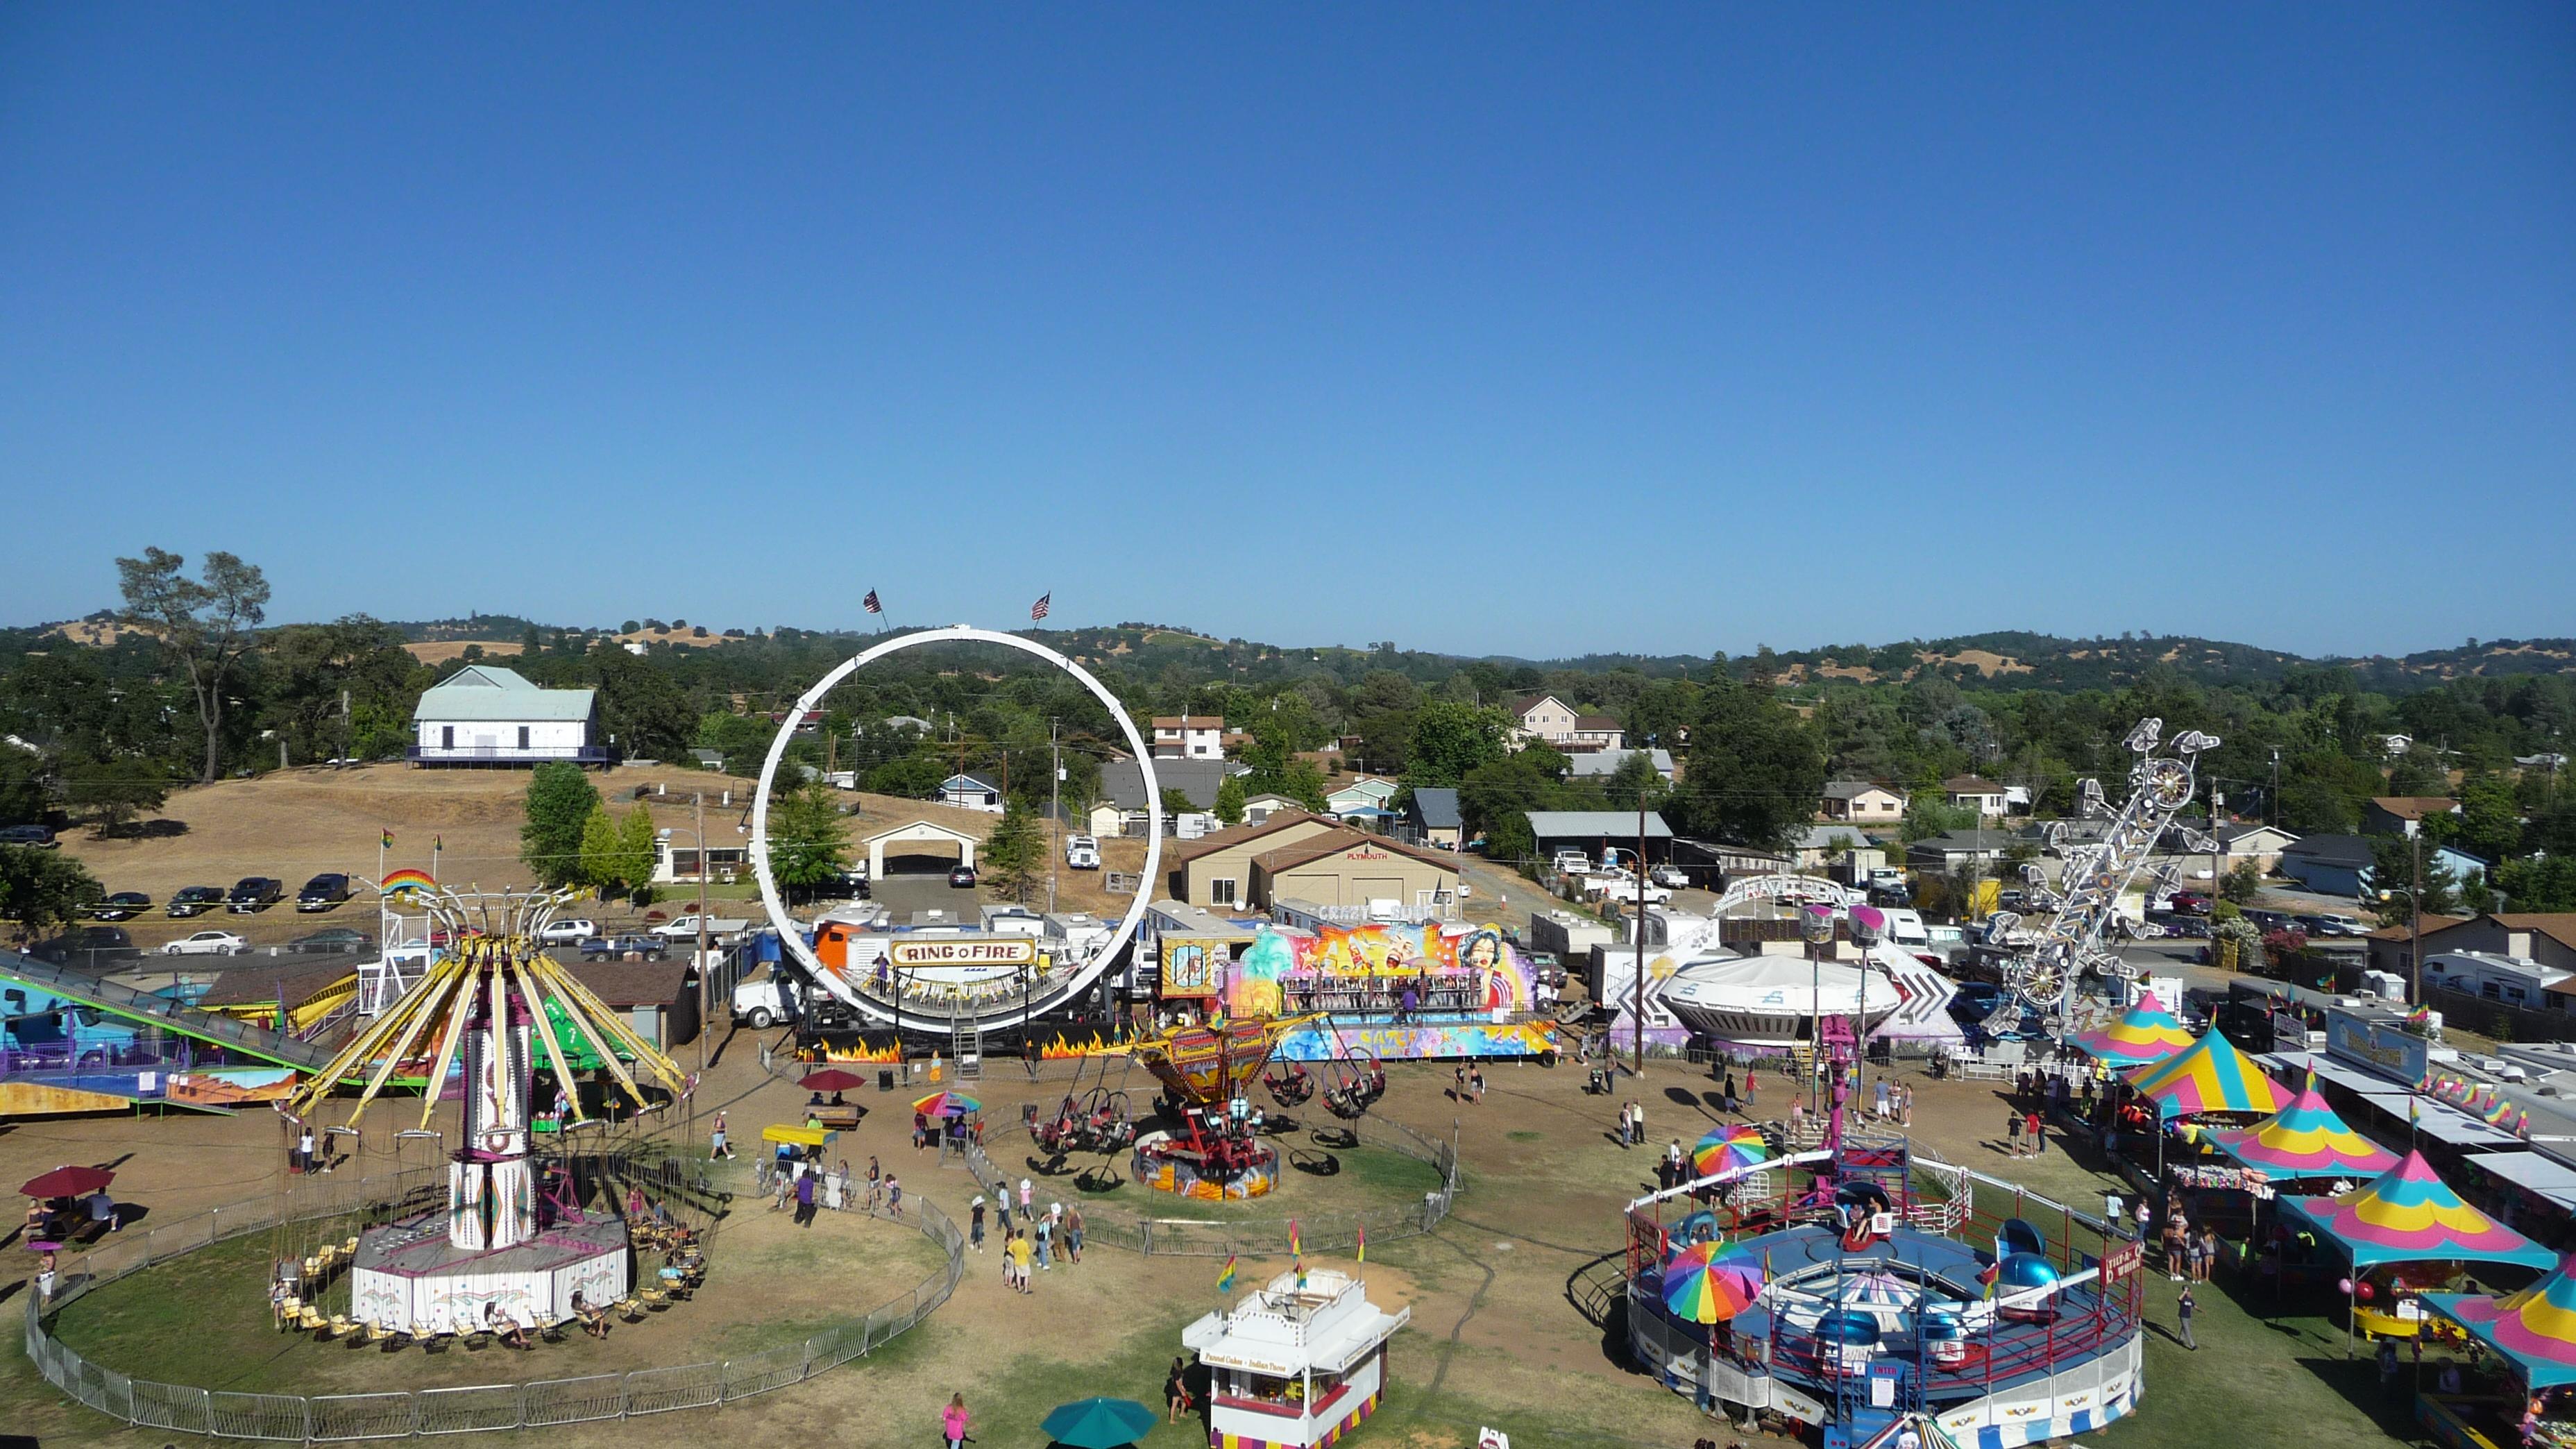 Amador County Fair